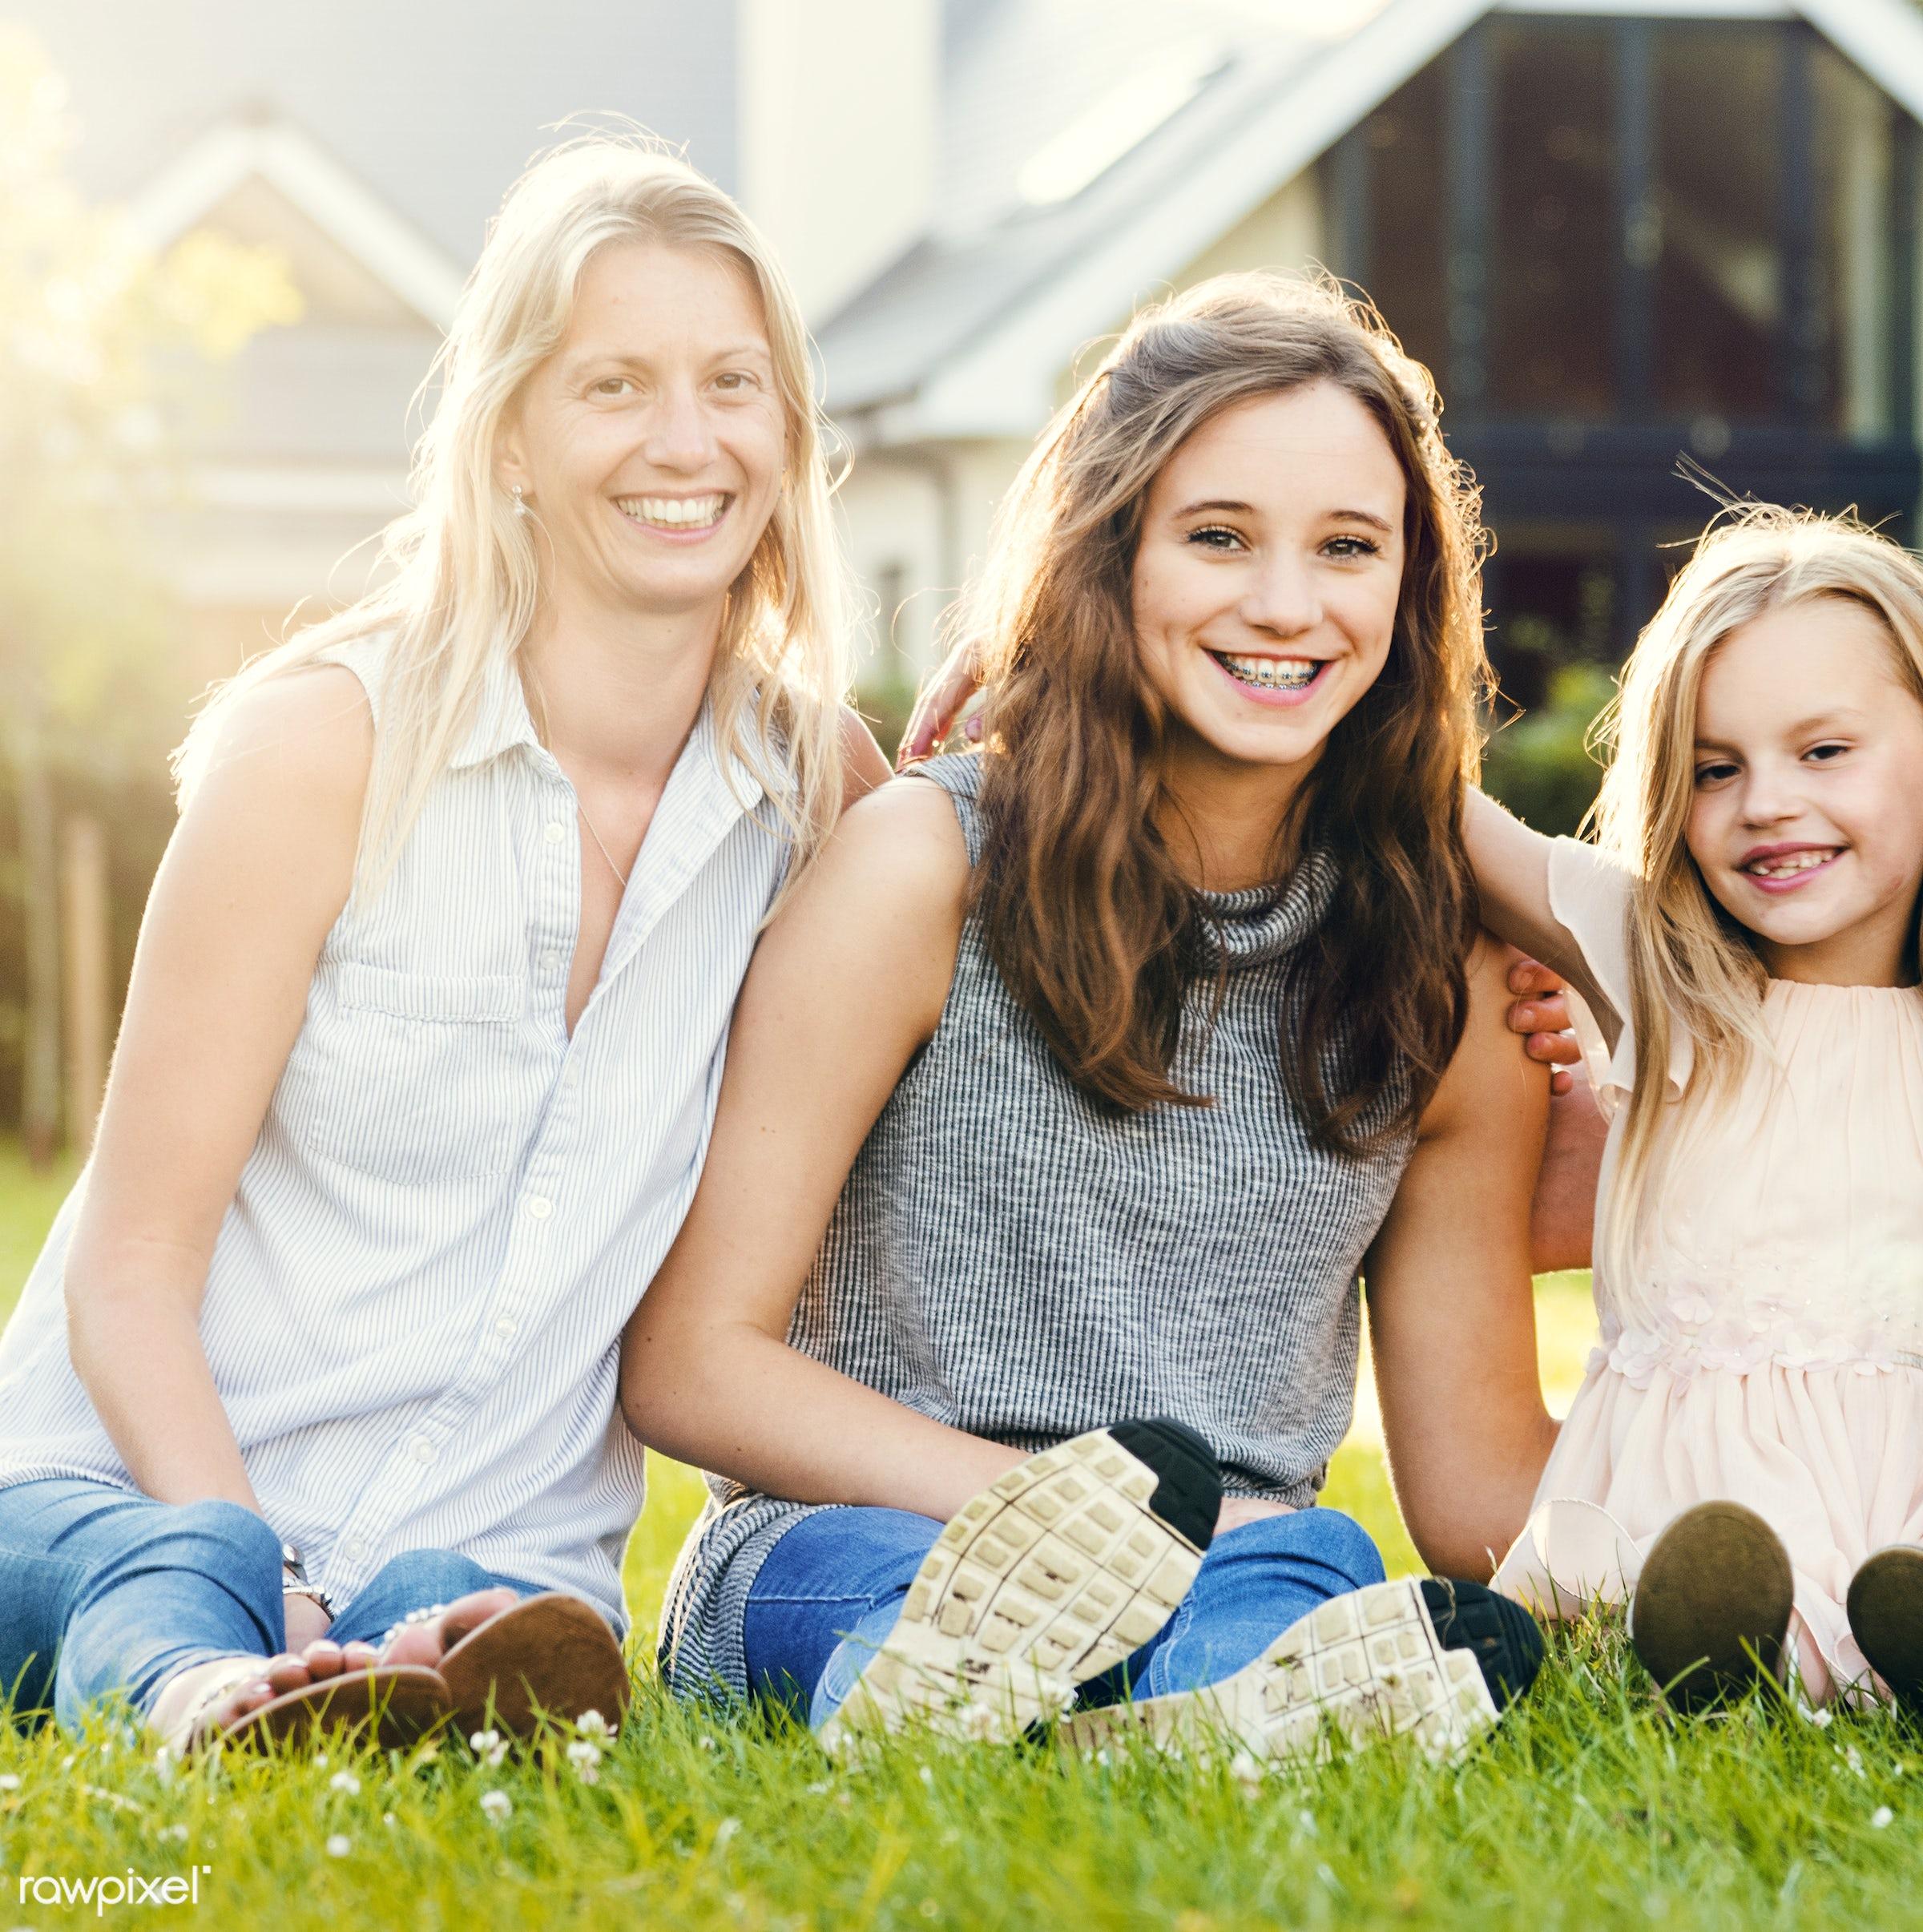 bonding, care, casual, cheerful, childhood, children, daughter, enjoyment, environmental, family, field, fun, garden,...